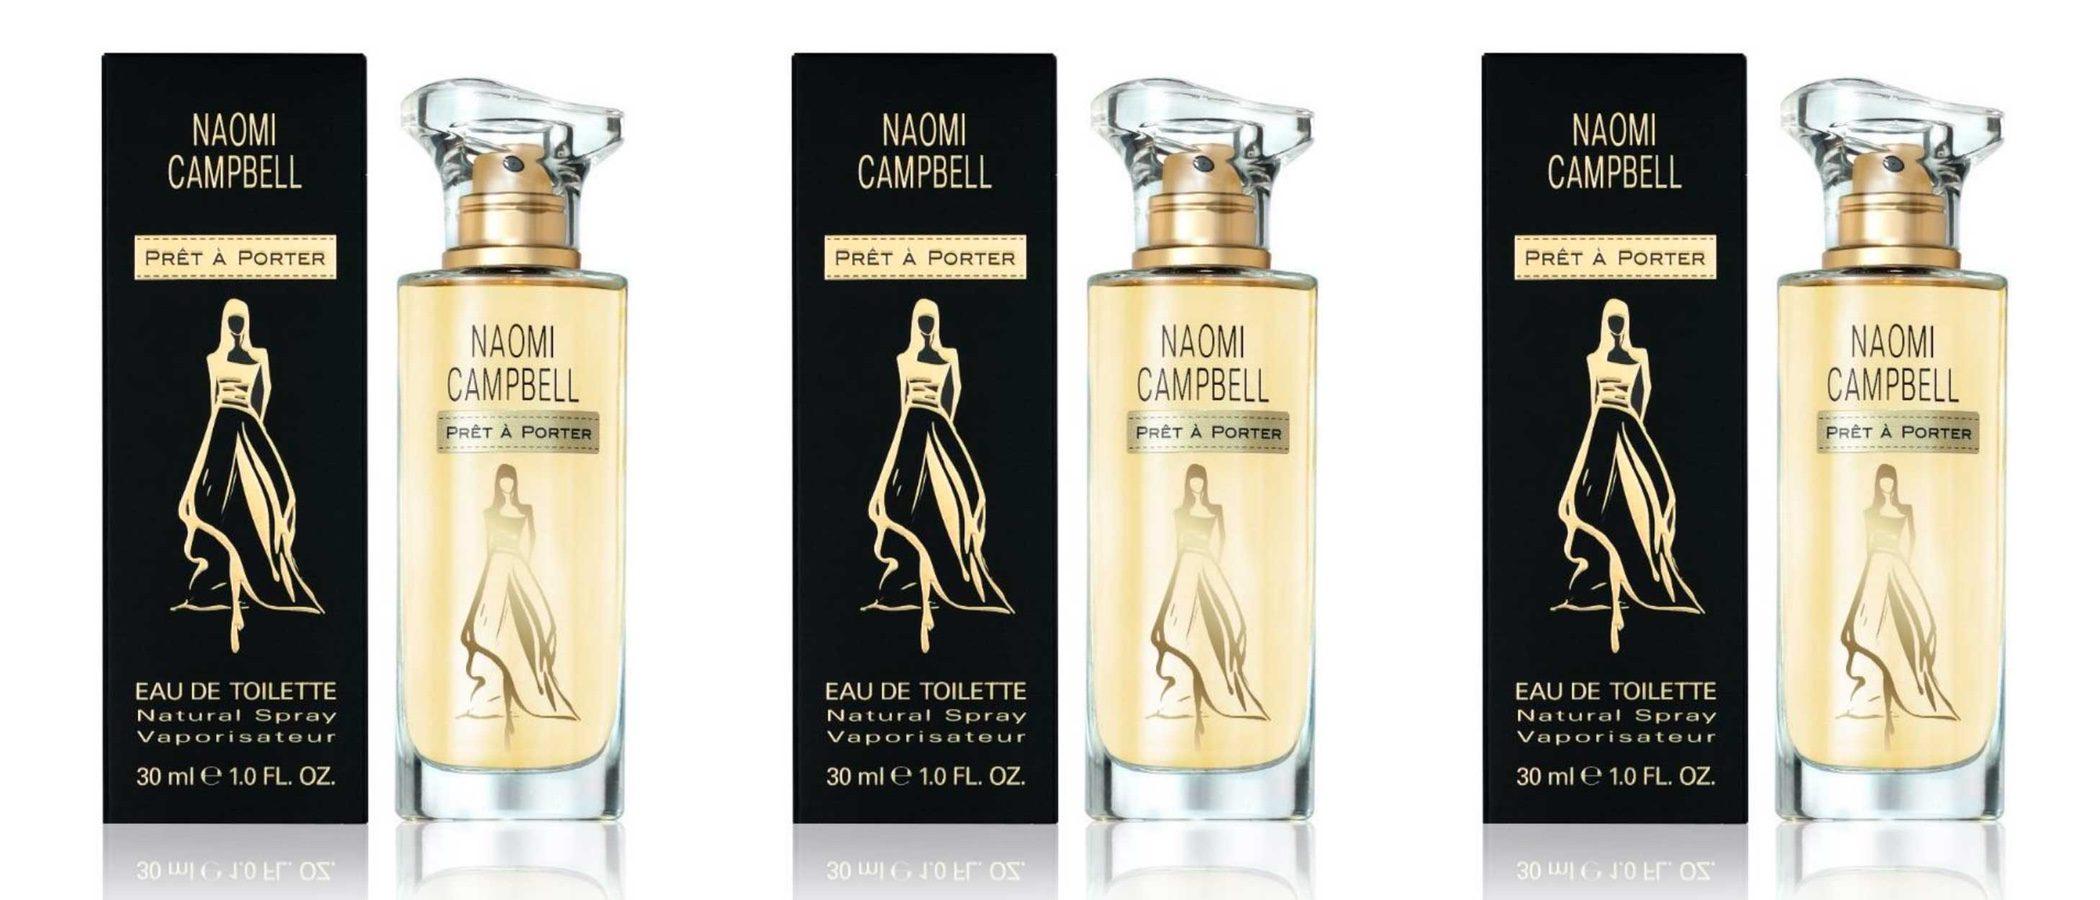 'Prêt à Porter': así es el nuevo perfume de Naomi Campbell